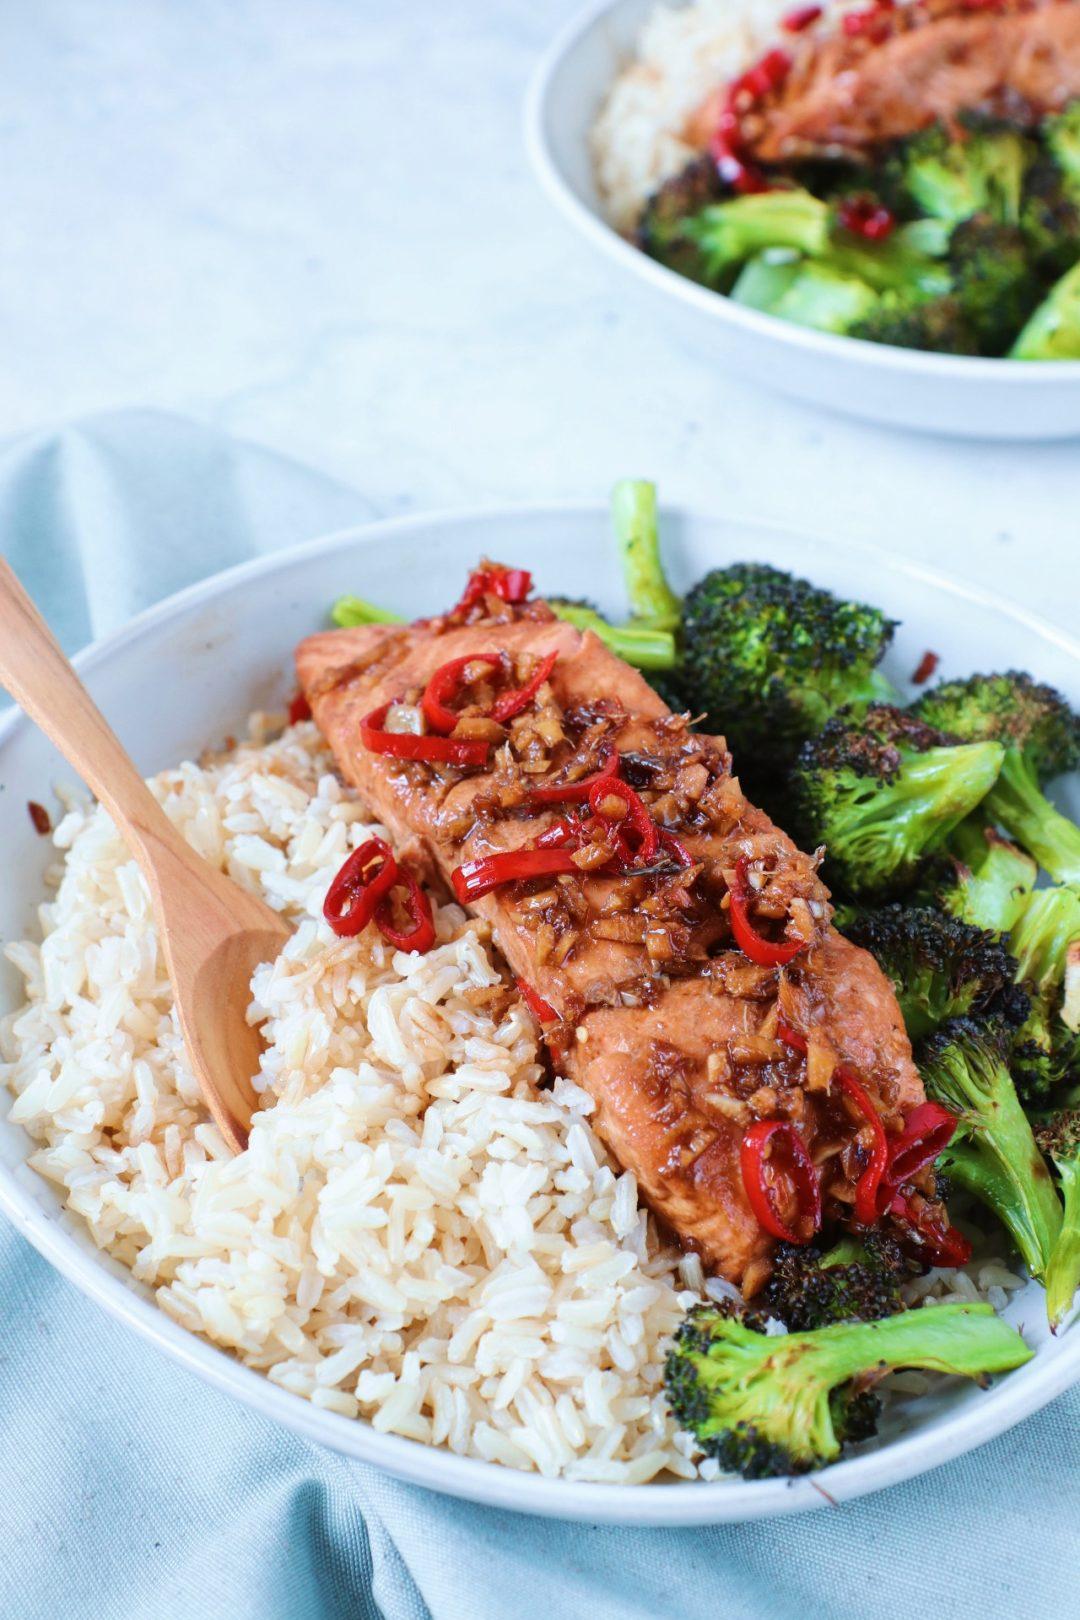 Zalm met broccoli en rijst www.jaimyskitchen.nl